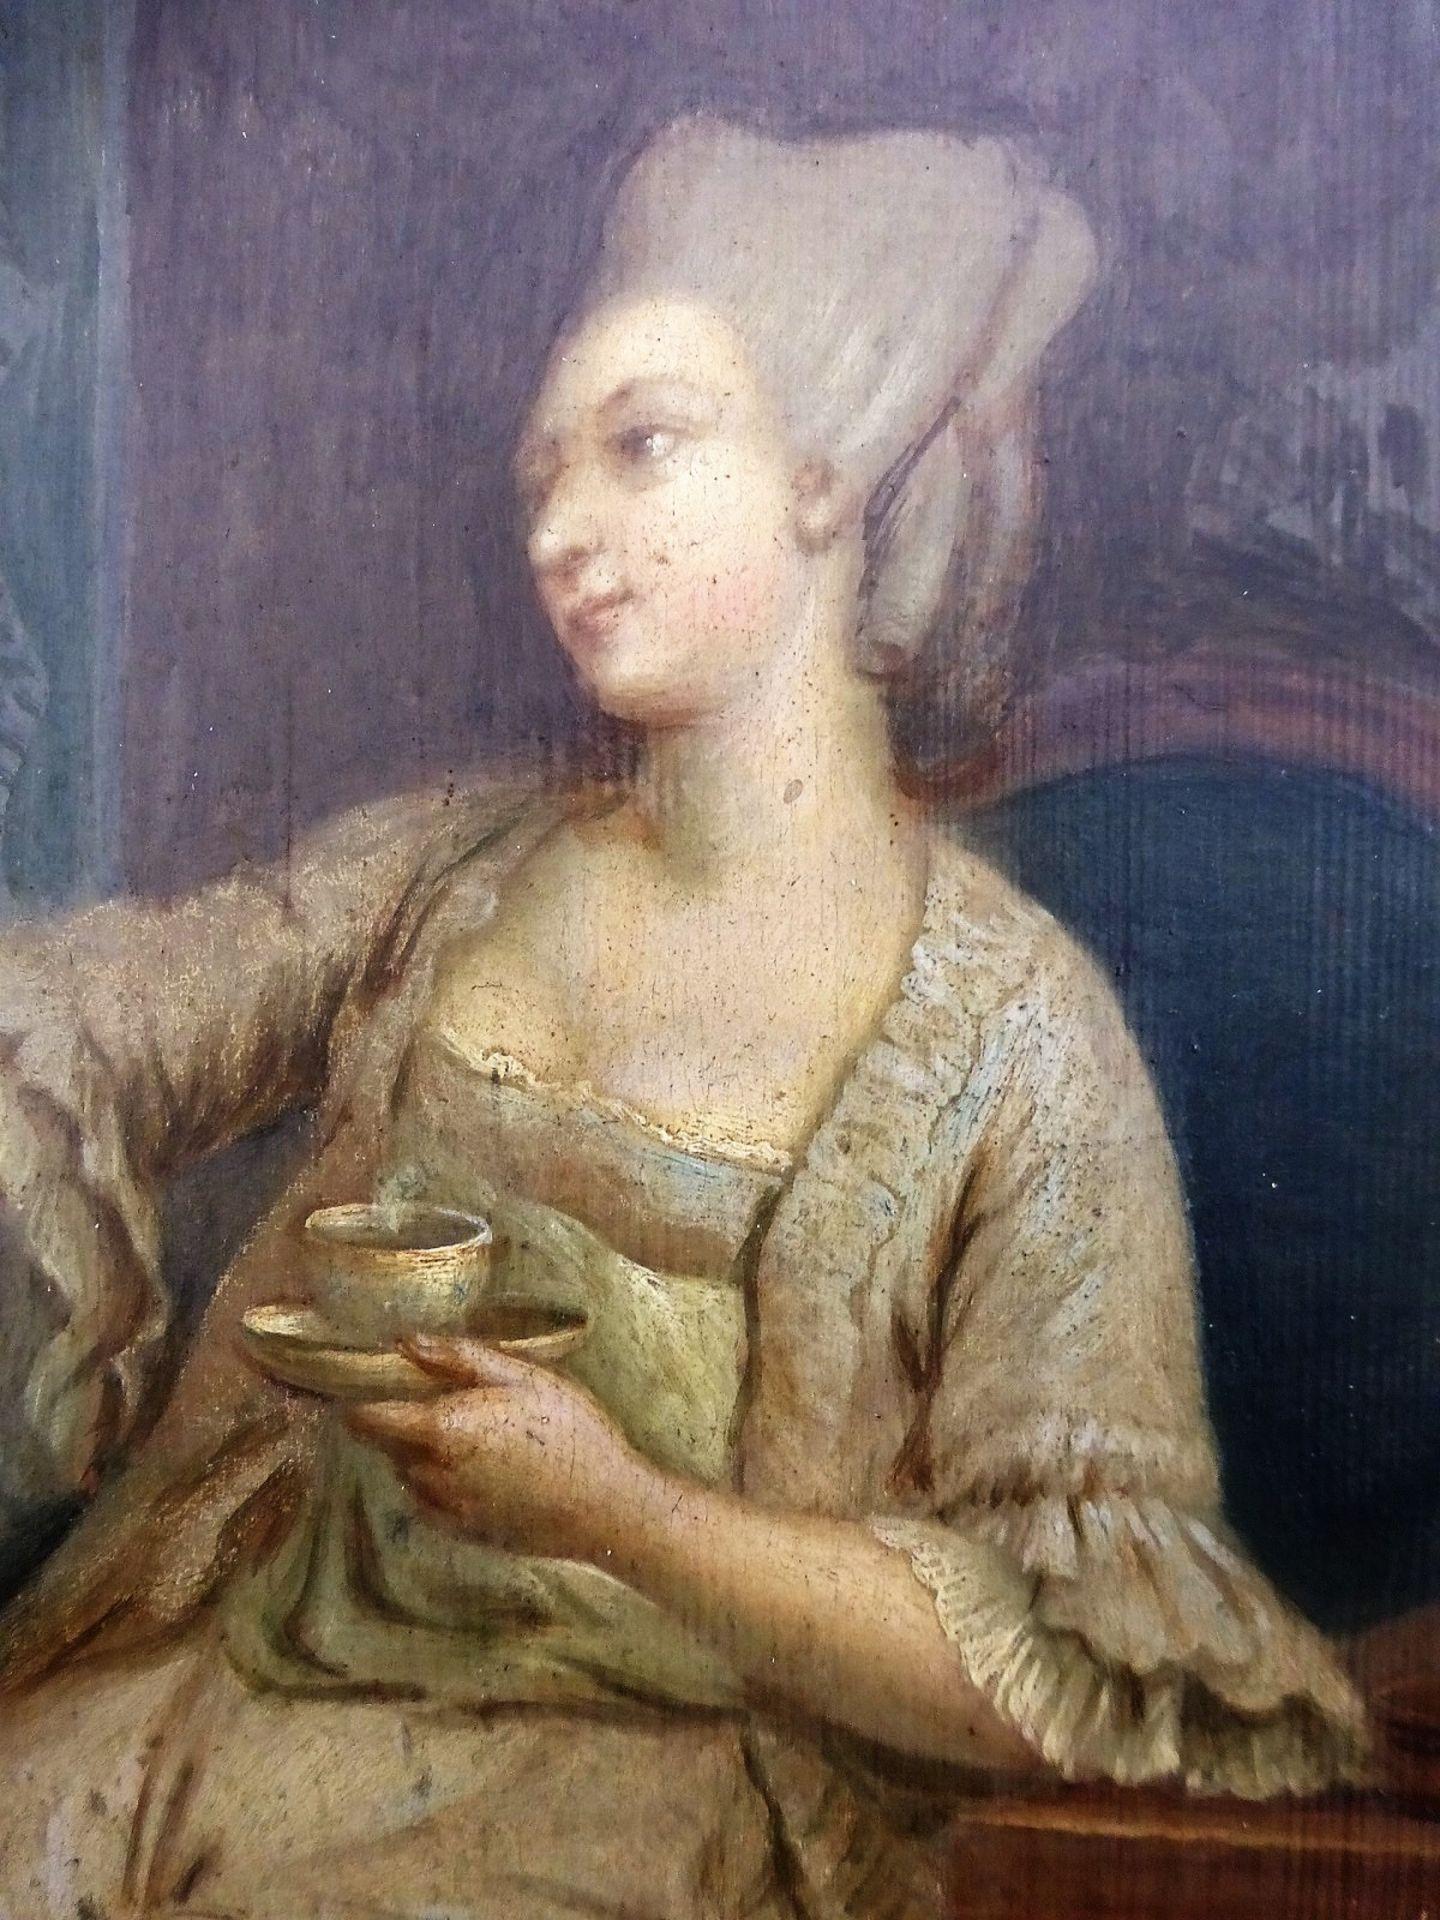 Gemälde Frankreich um 1800 - Image 3 of 4